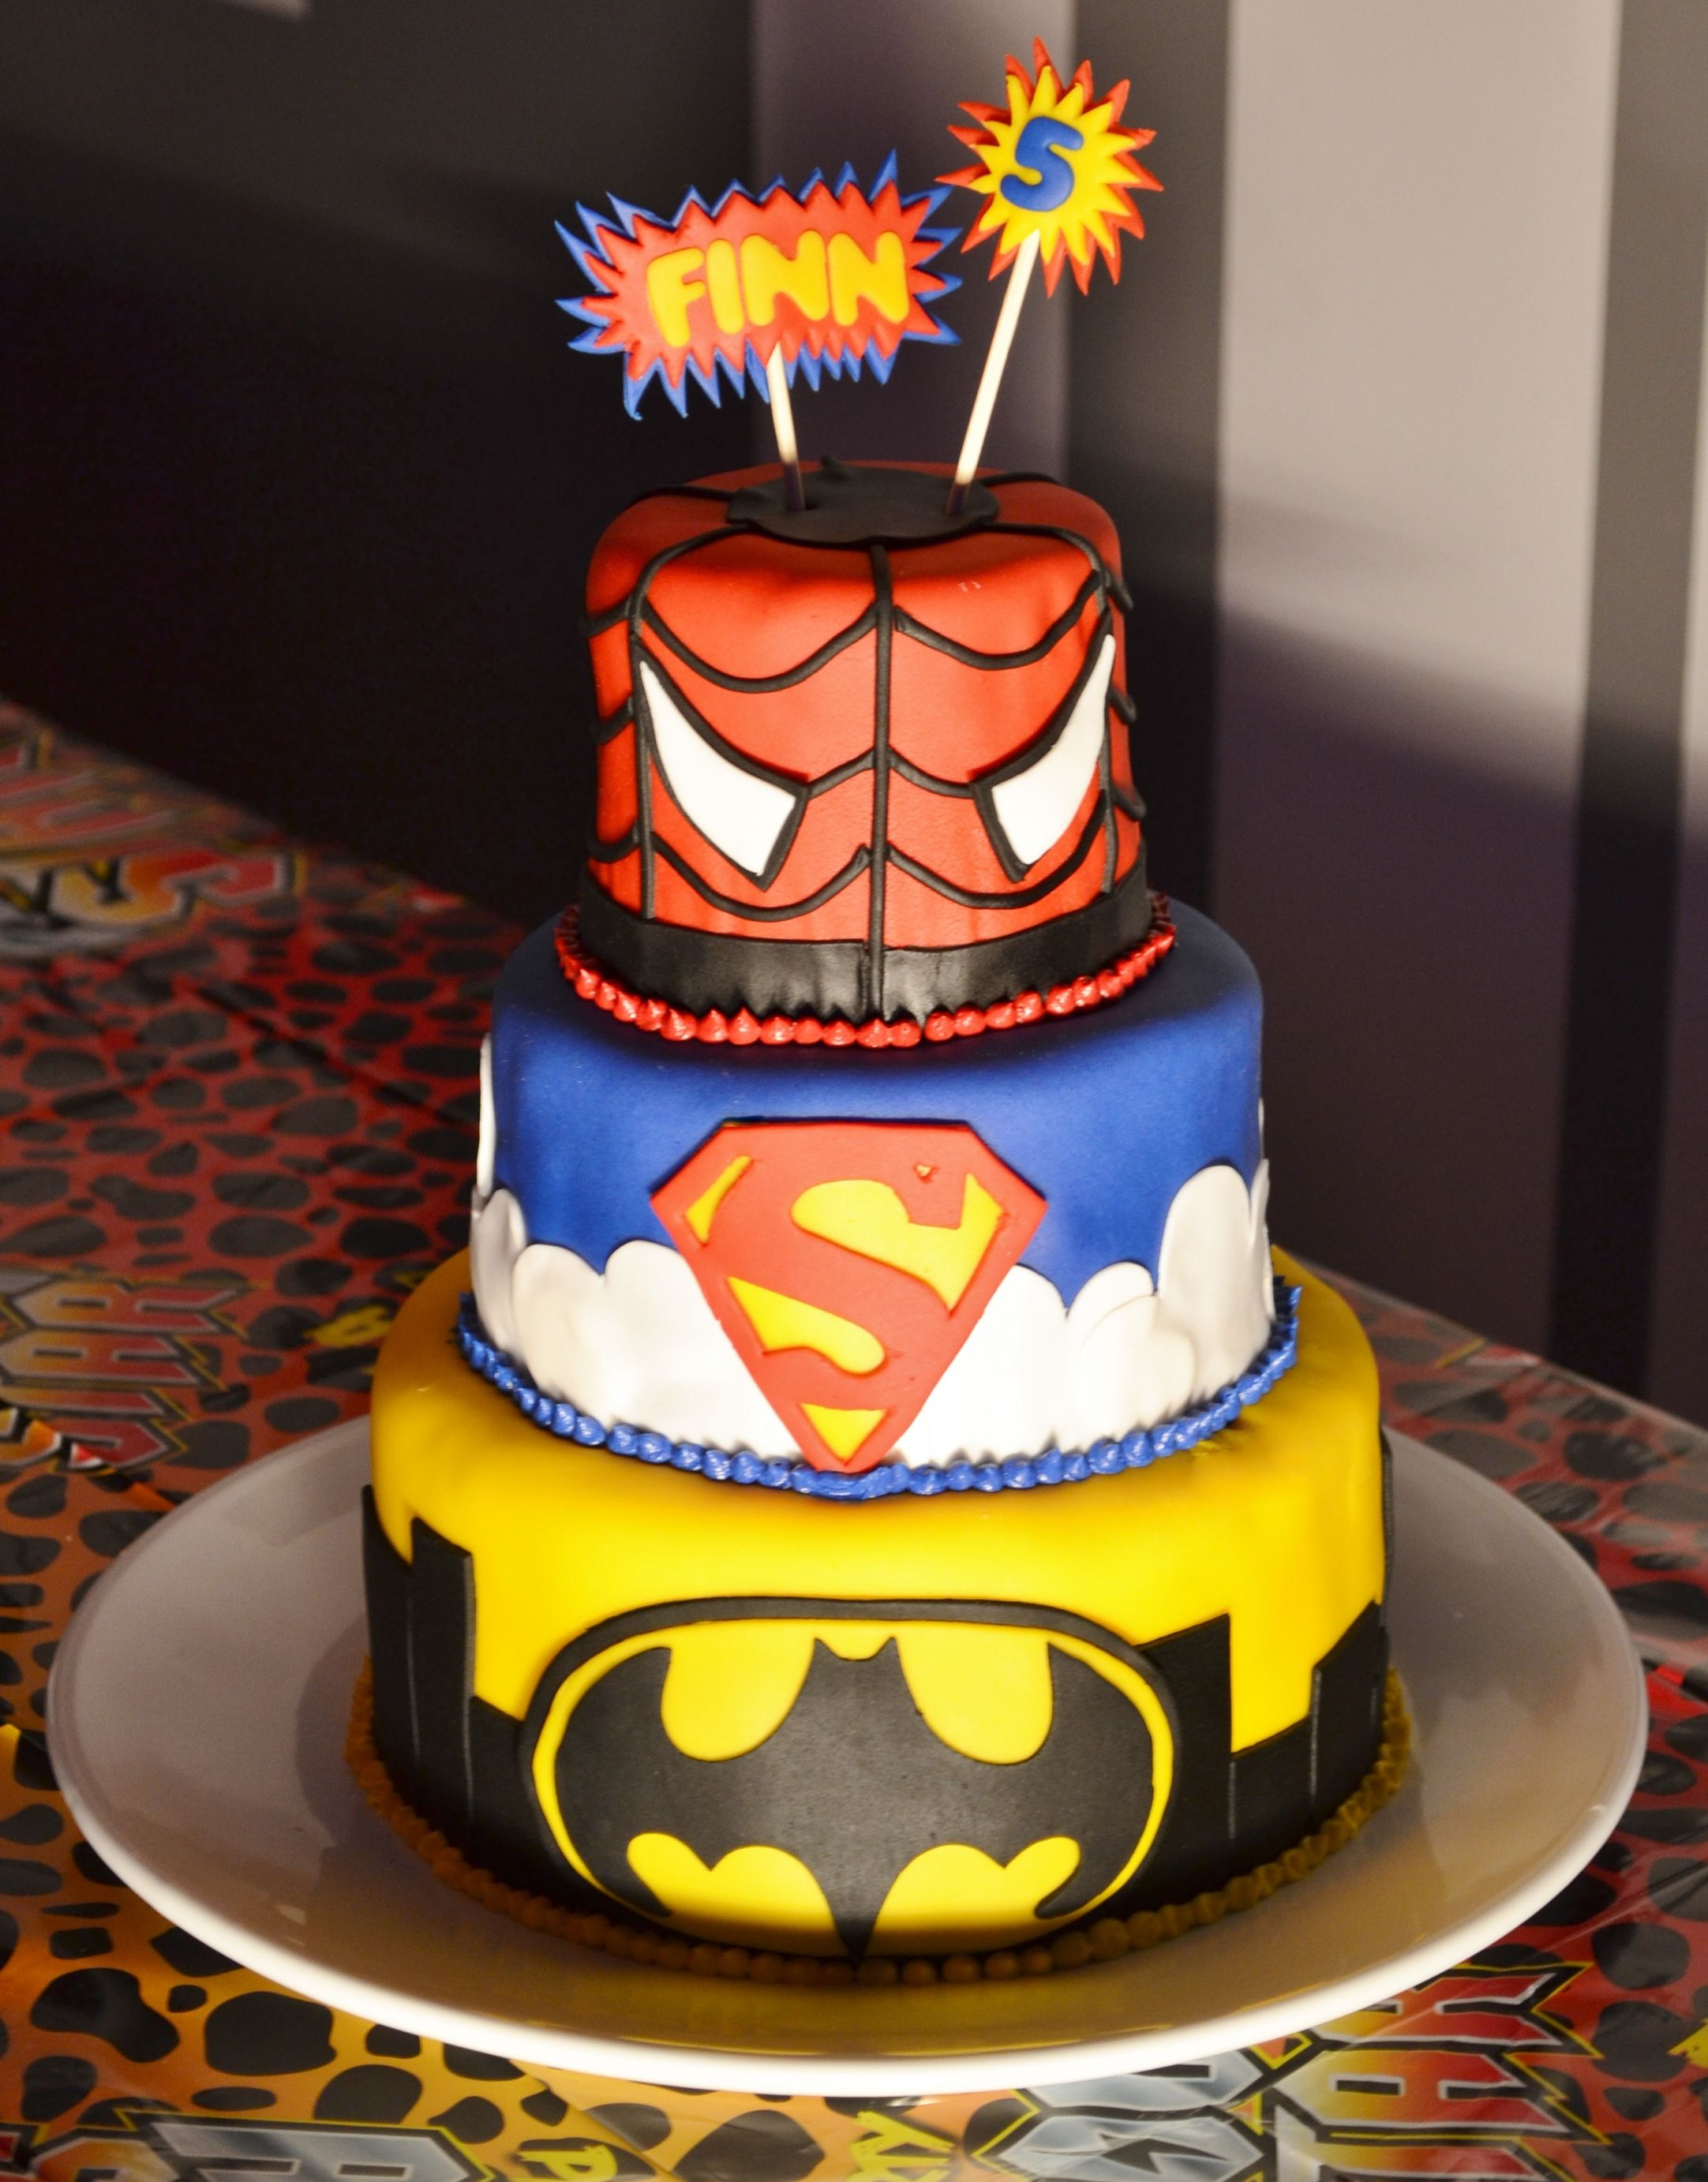 Superhero 5th Birthday 5th Birthday Cake Boy Birthday Cake Boy Birthday Parties